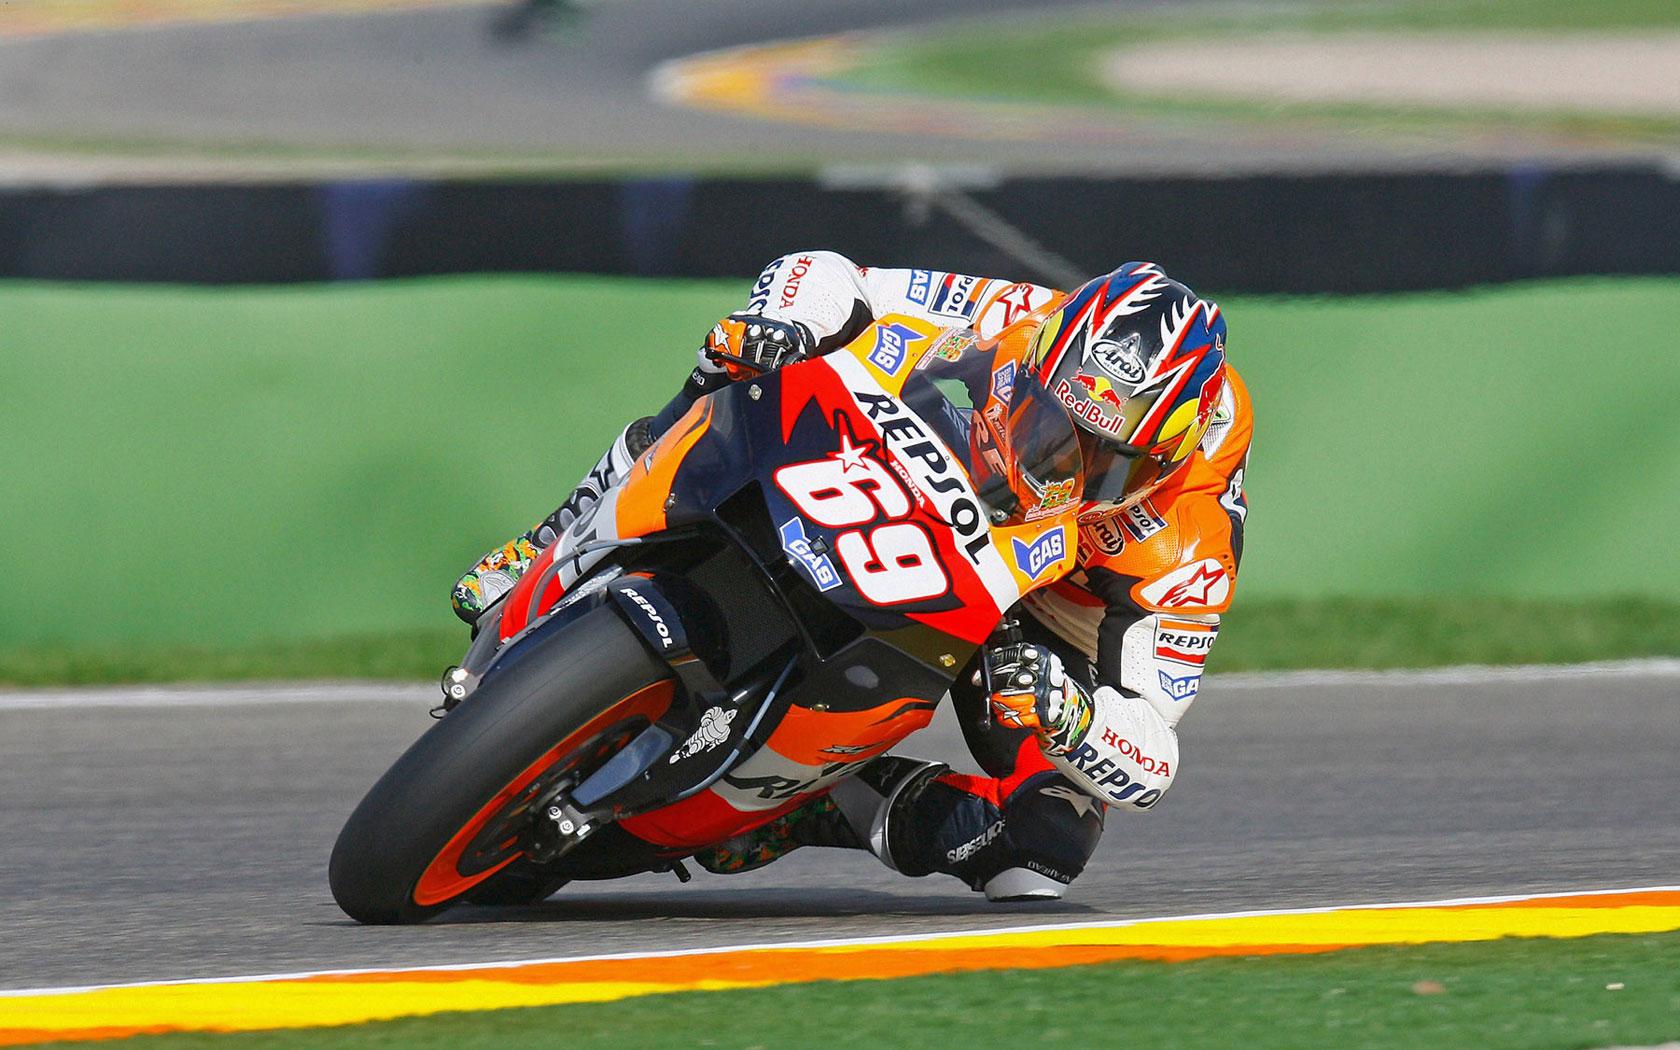 Roundup 40 Stunning Widescreen MotoGP Wallpapers CrispMe 1680x1050